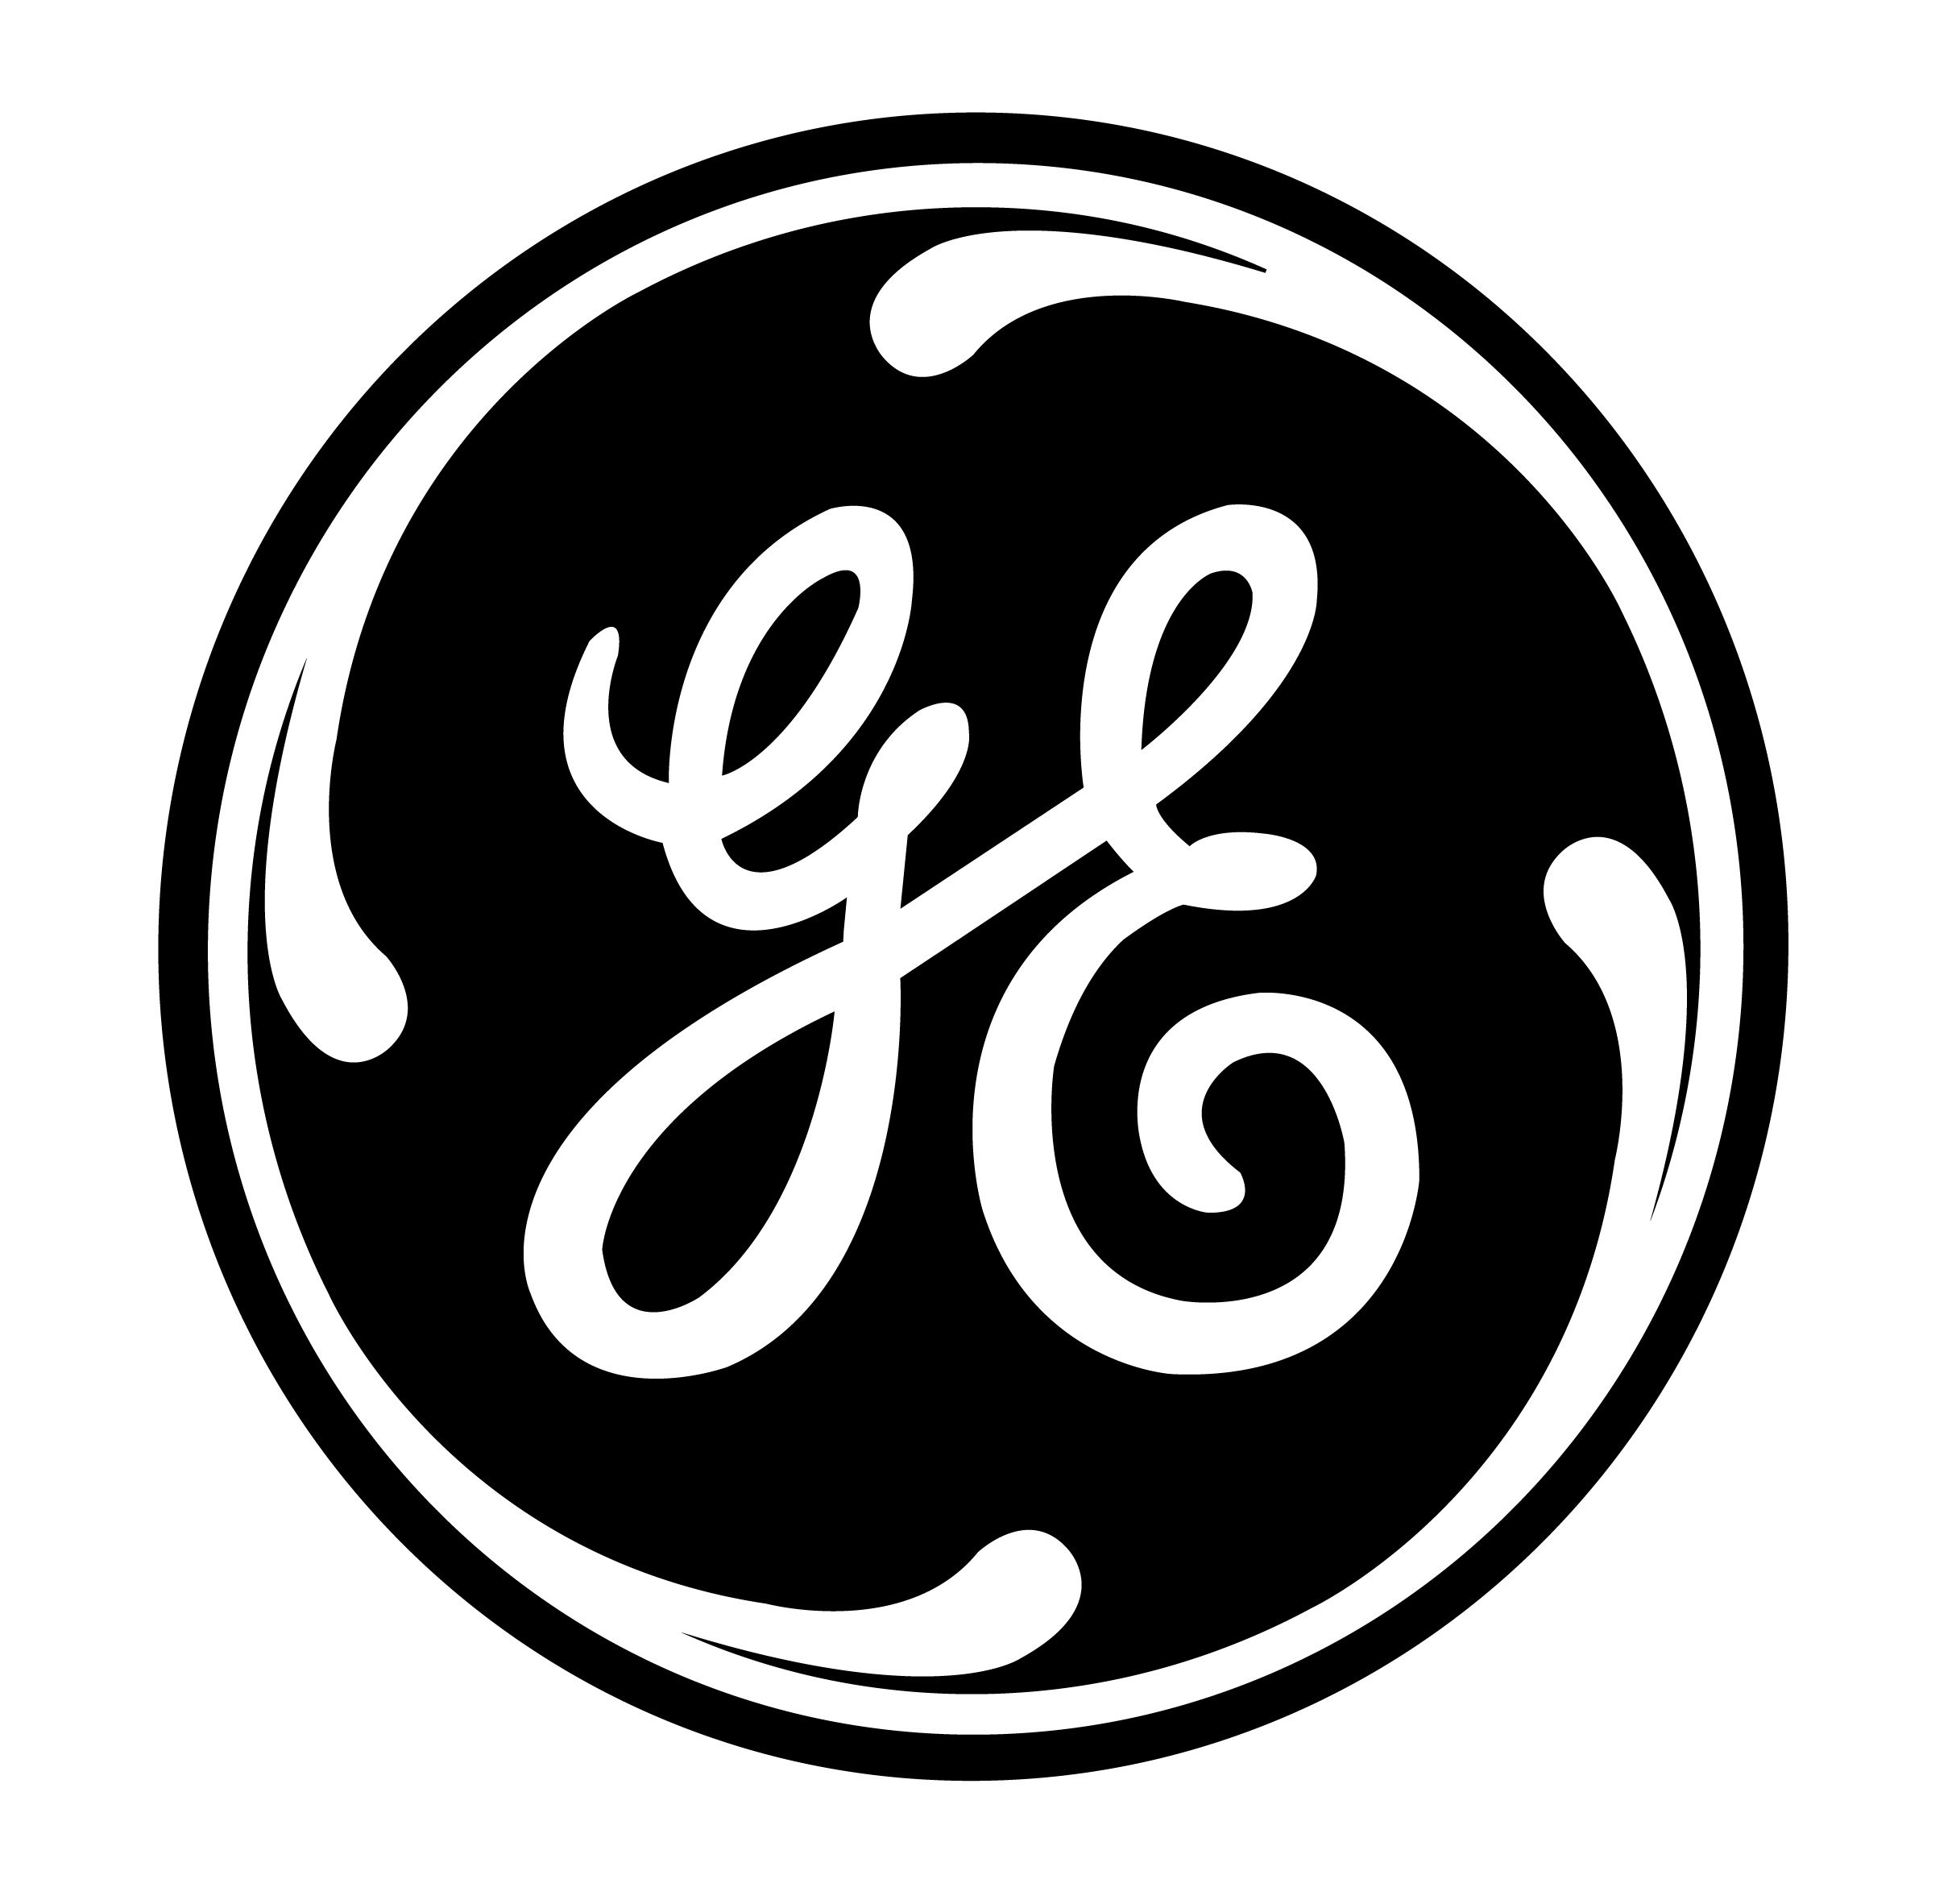 #7 General Electric